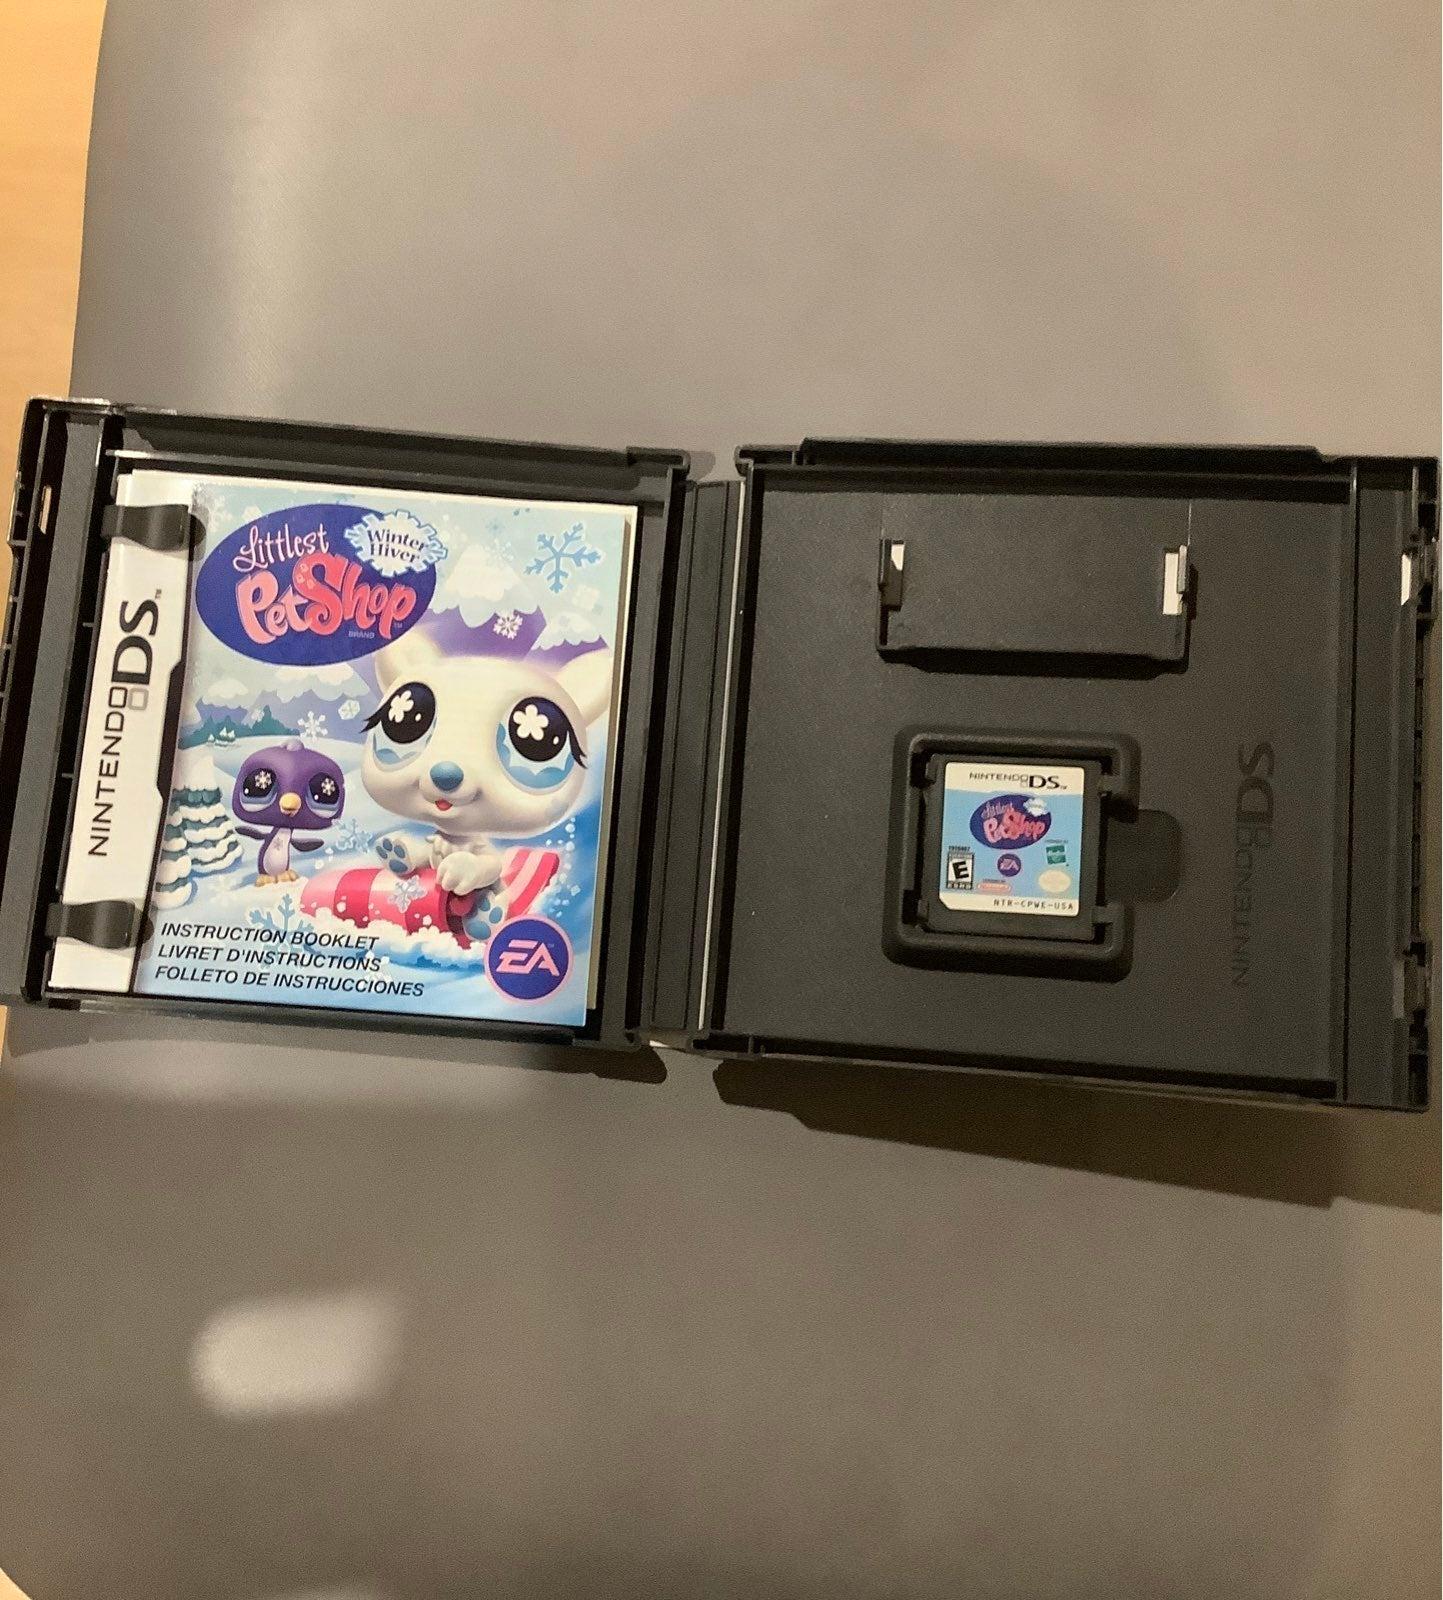 Nintendo DS Littlest Pet Shop